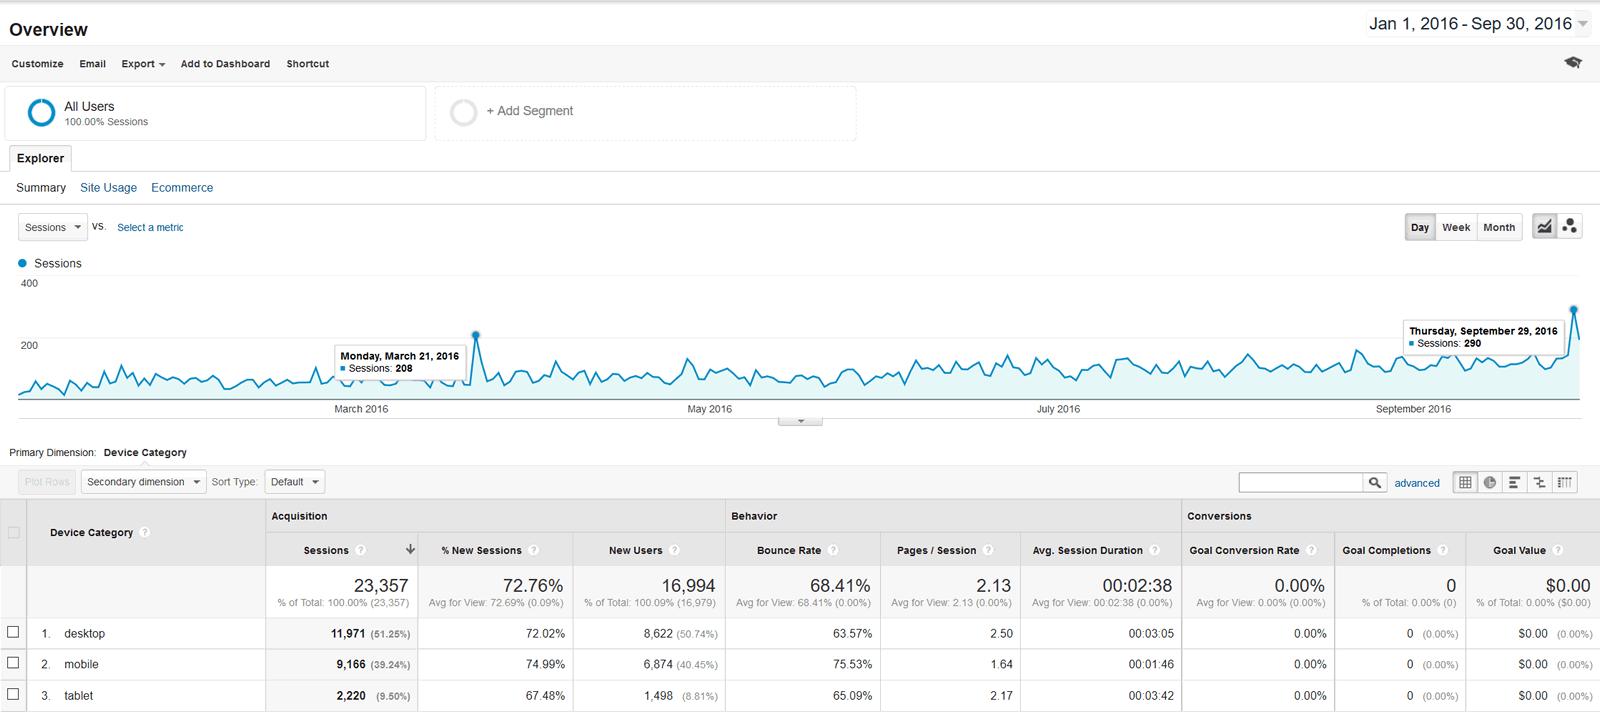 Google Analytics - Device Overview - 2016-01-01 through 2016-09-30